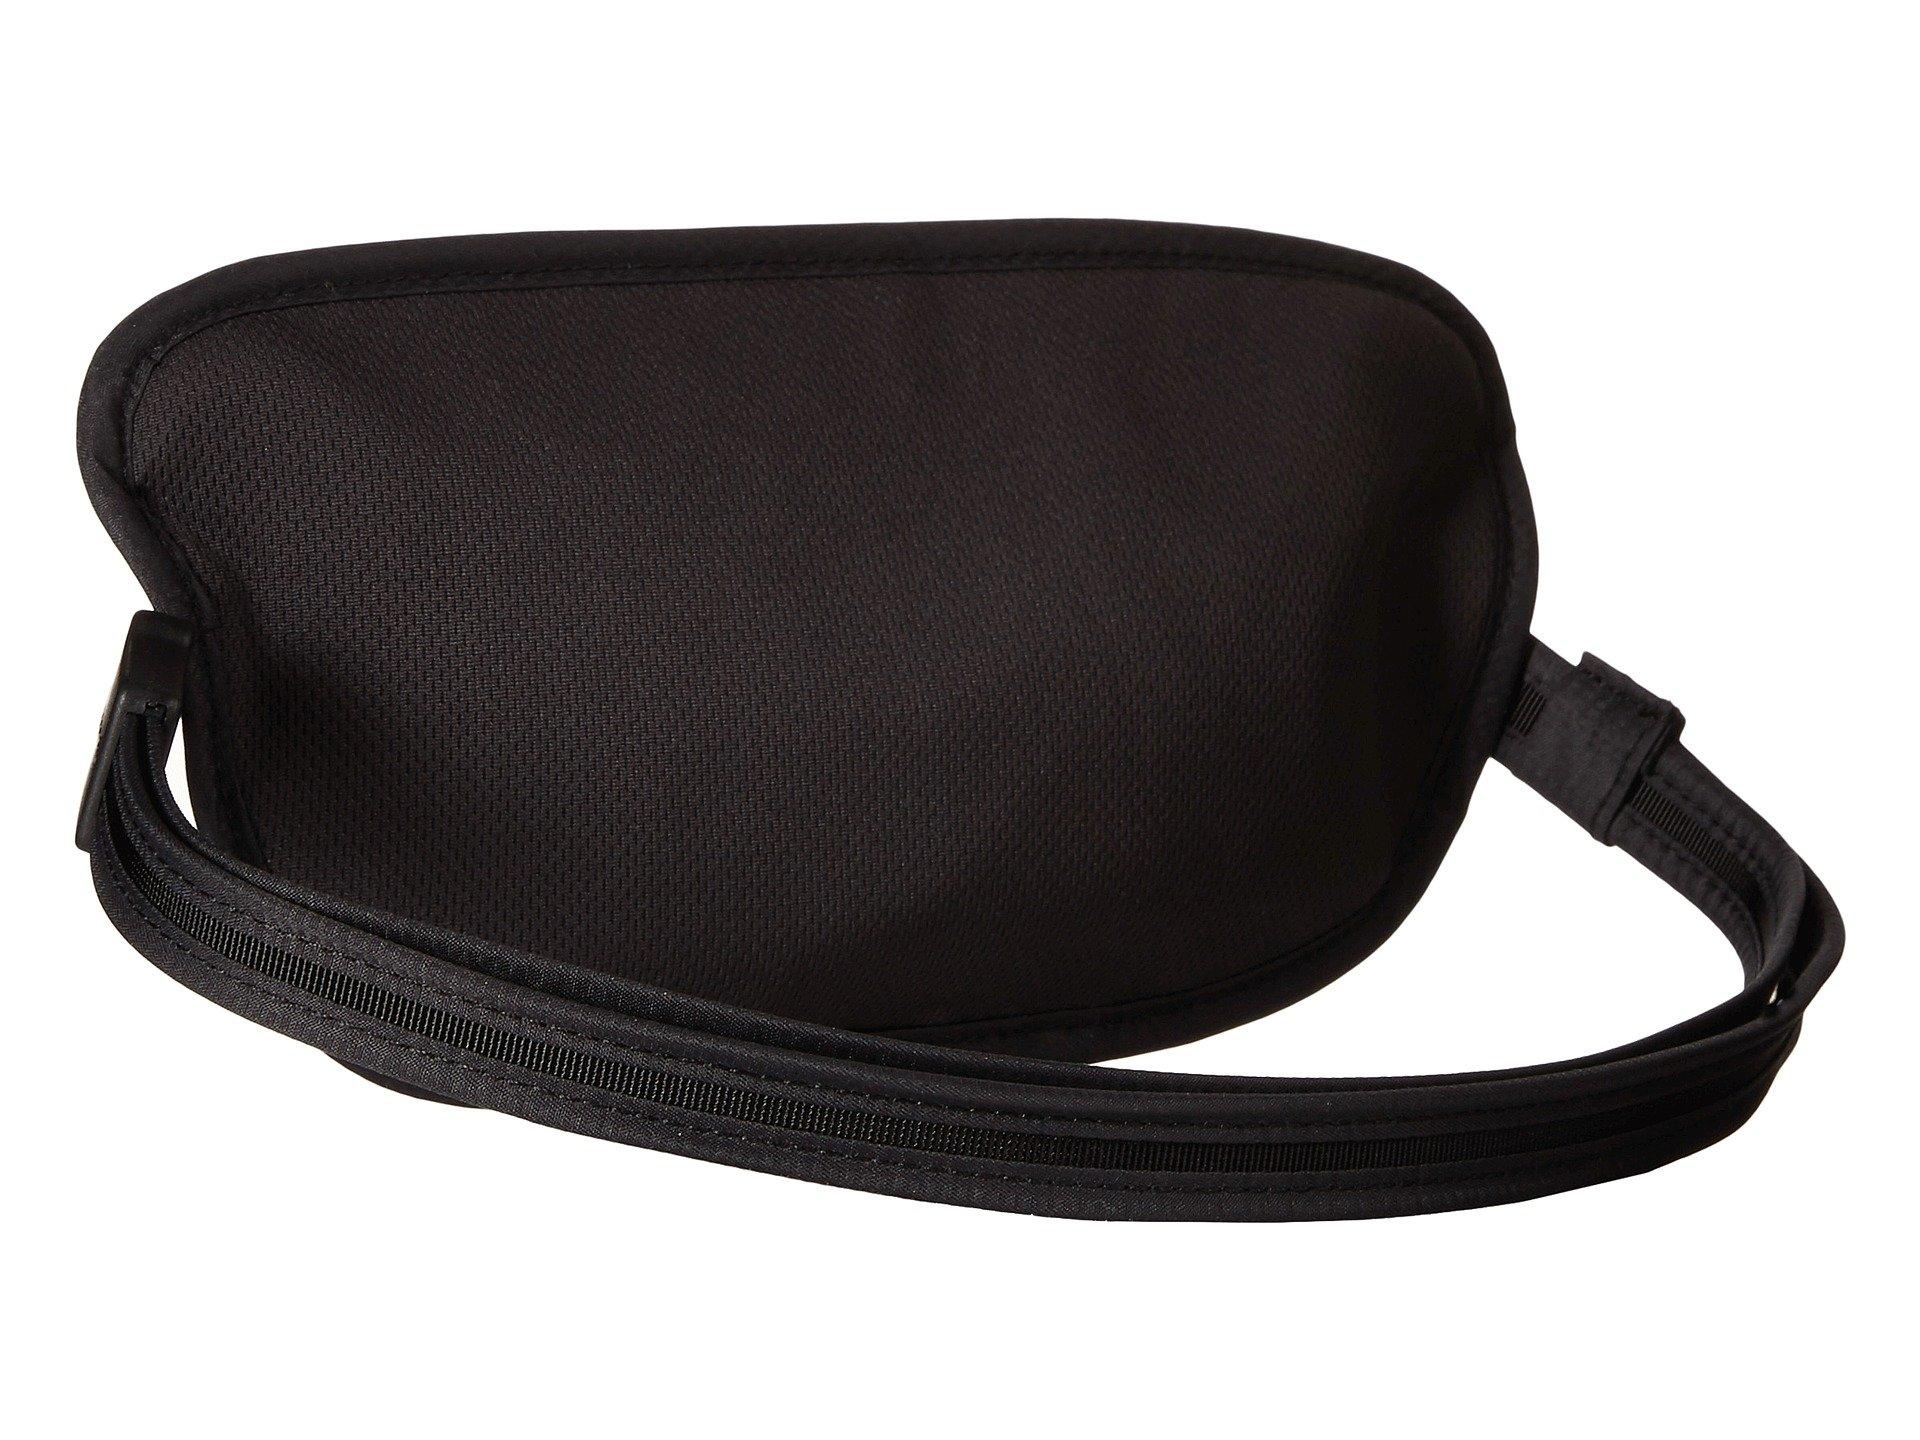 Black Waist Pacsafe Wallet Coversafe X100 Rfid ZfWU70Aq